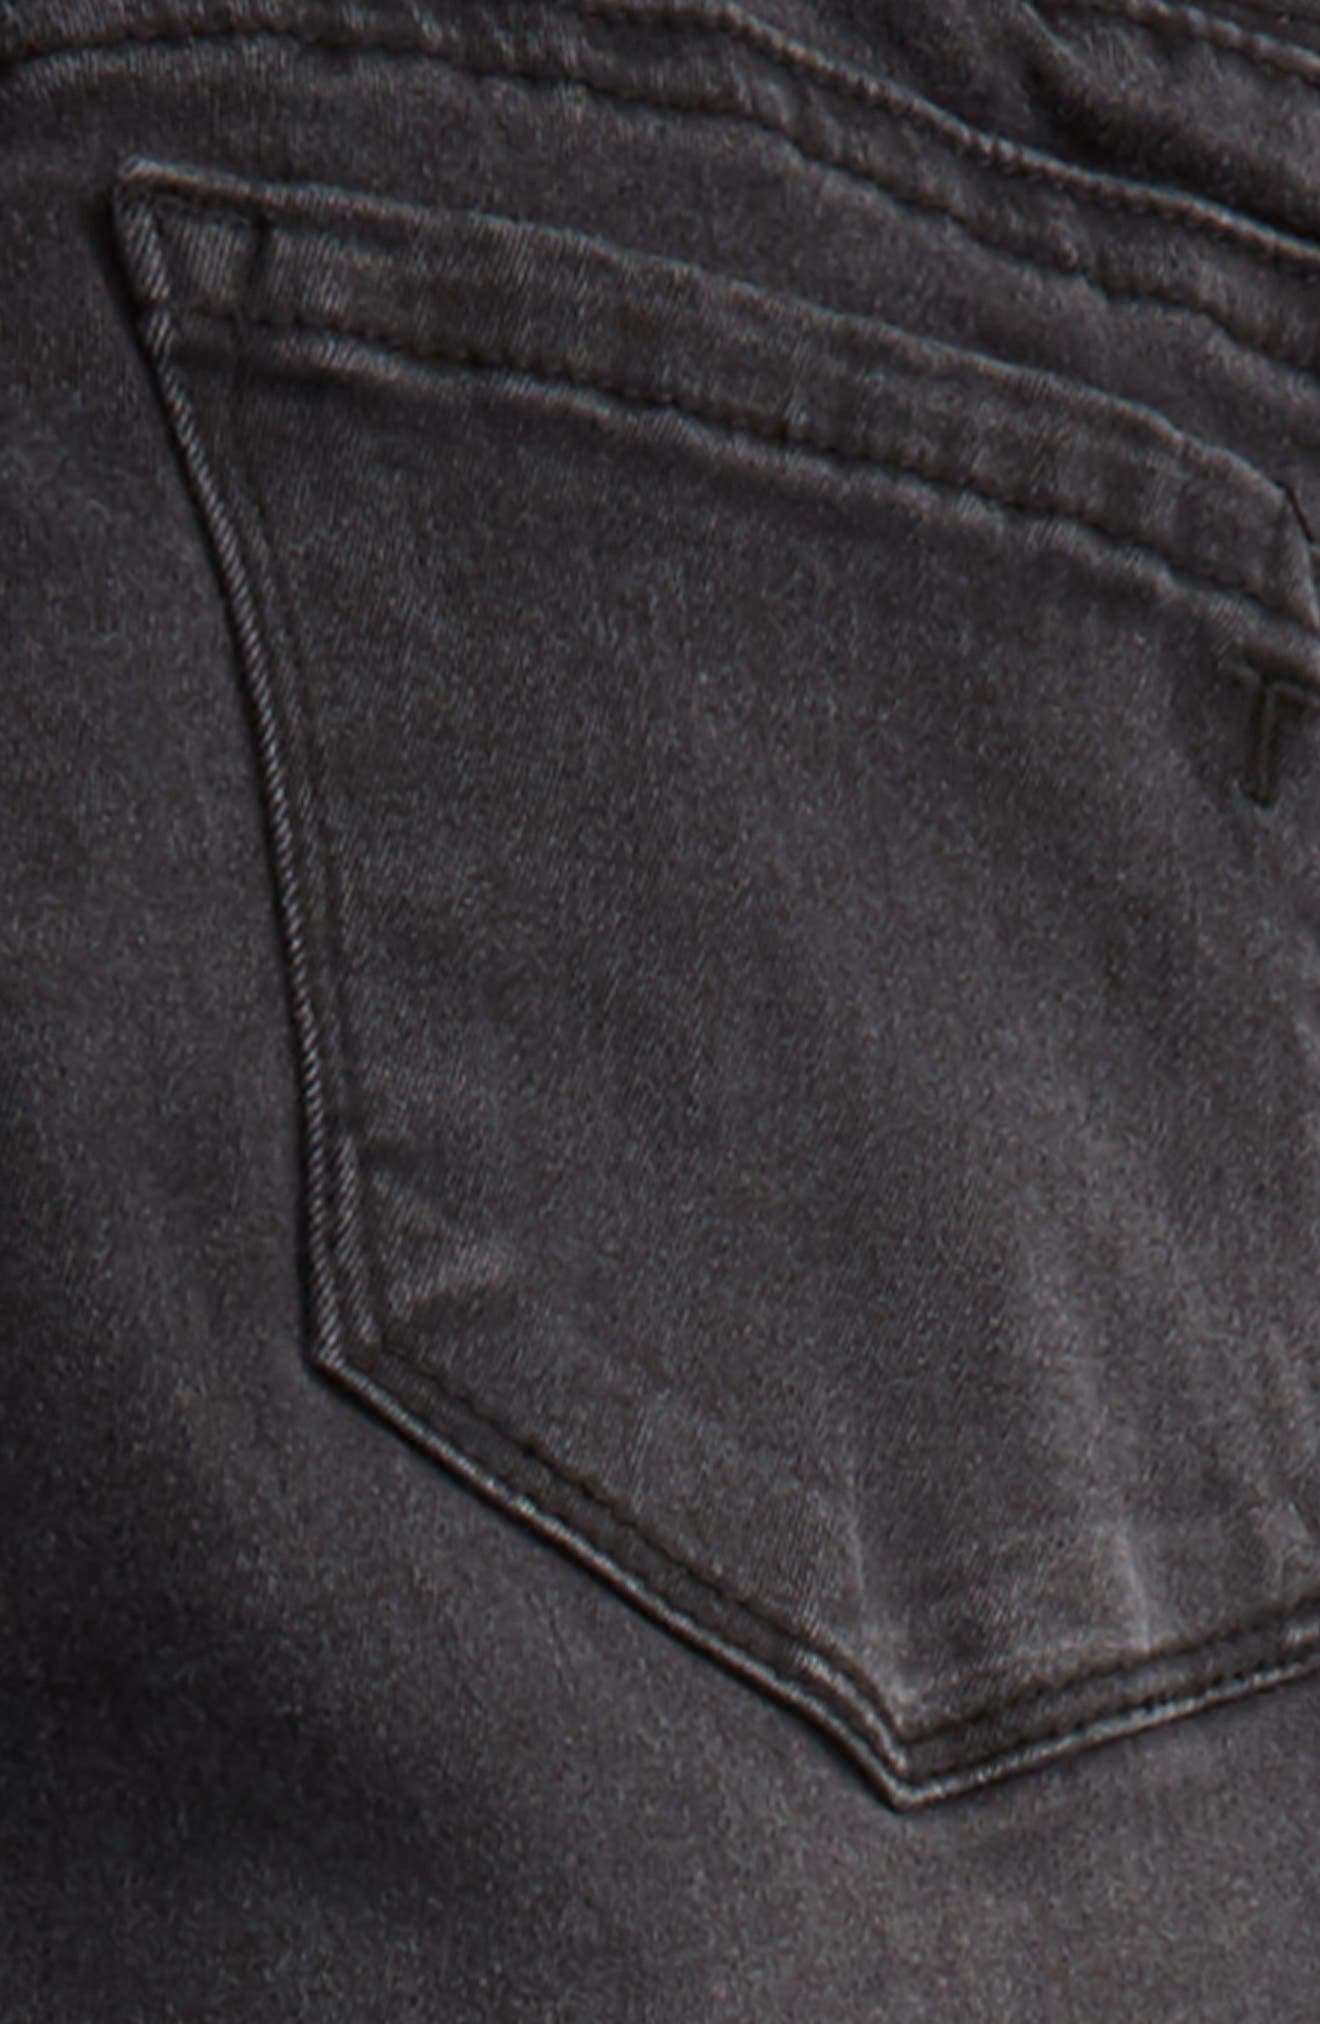 Alternate Image 3  - Tractr Frayed Denim Pants (Big Girls)